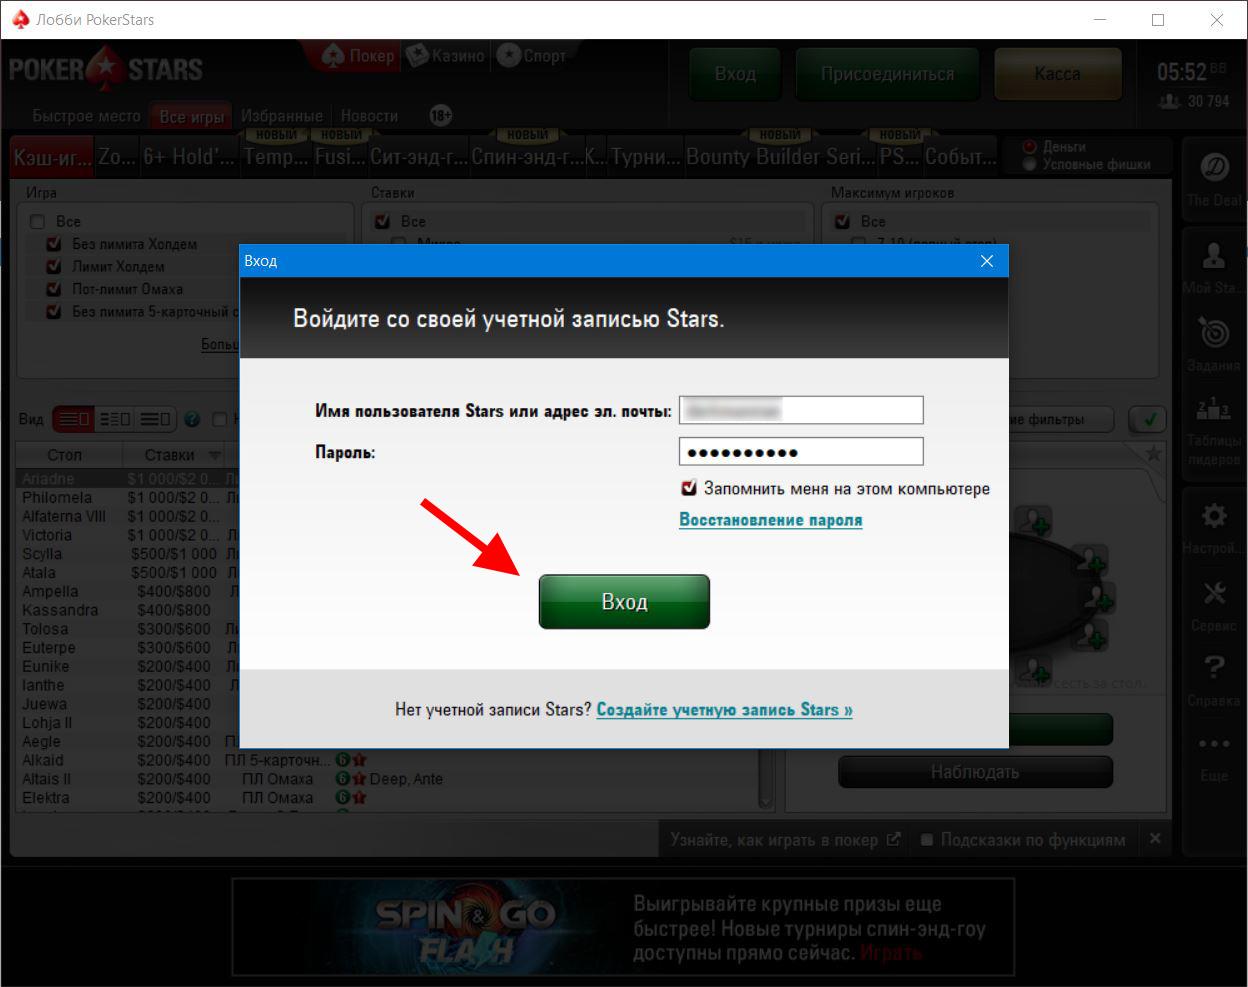 Авторизация в клиенте PokerStars после установки.